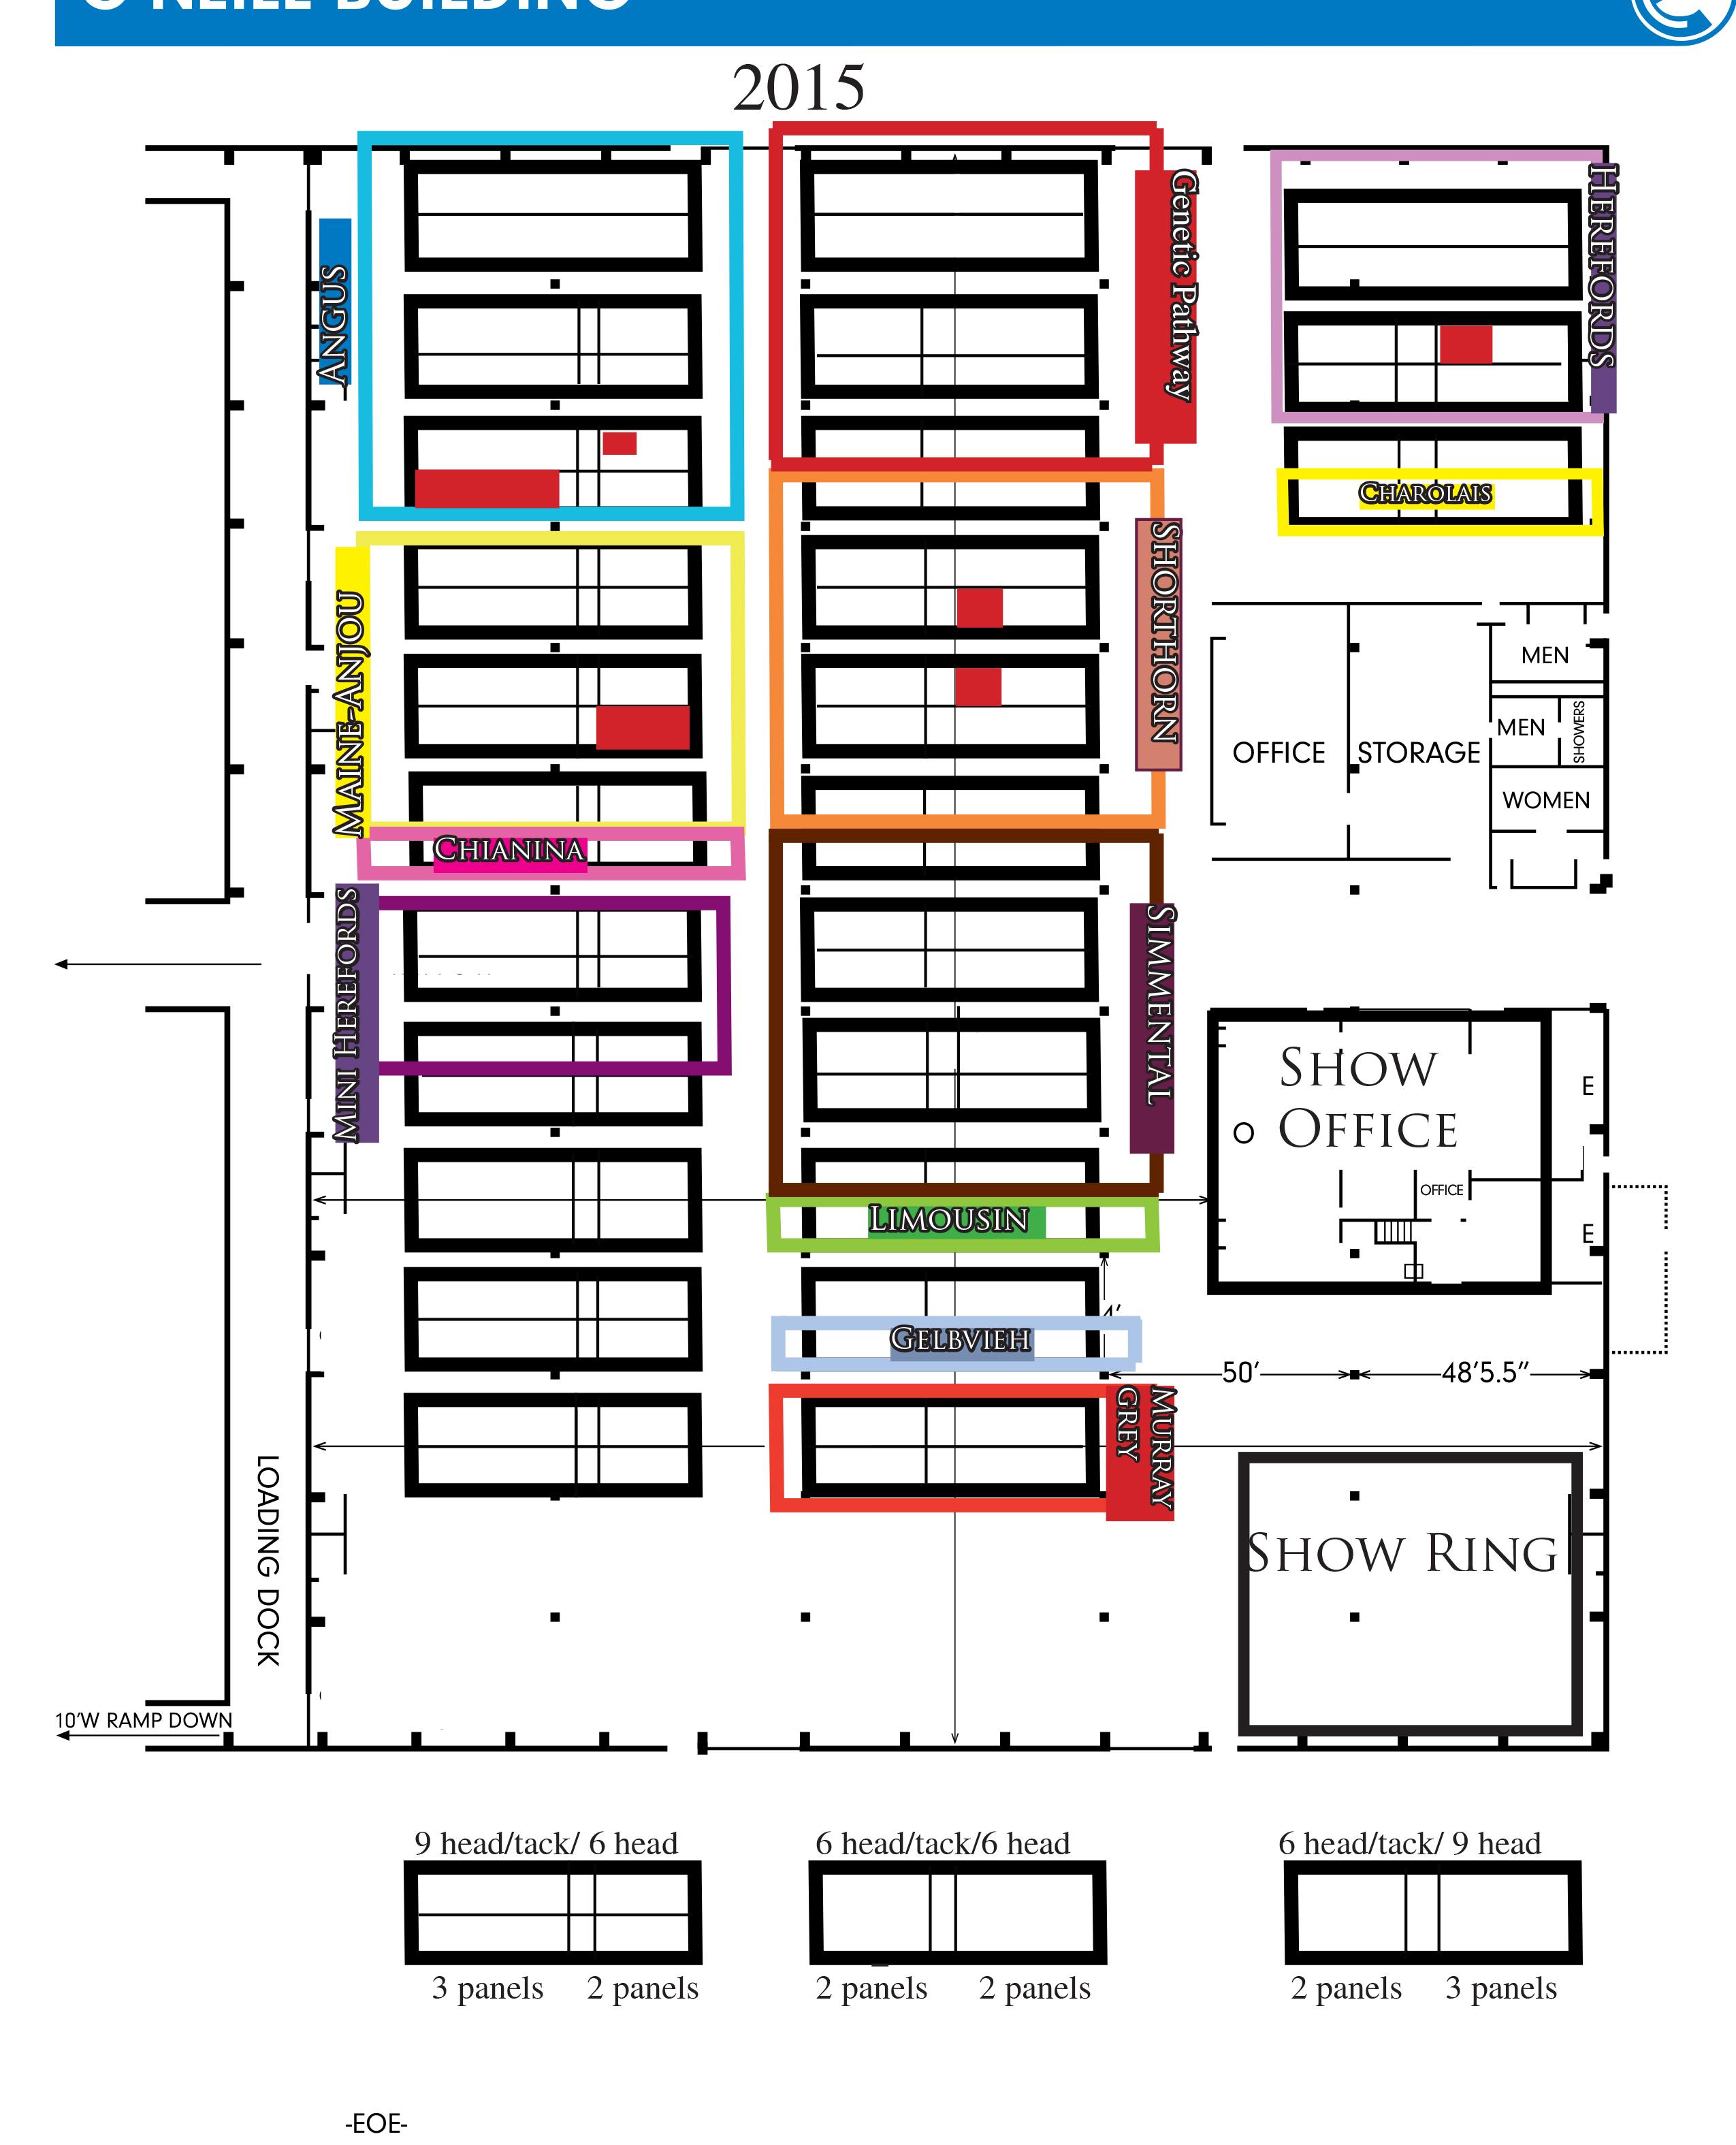 Oneill Floor Plan